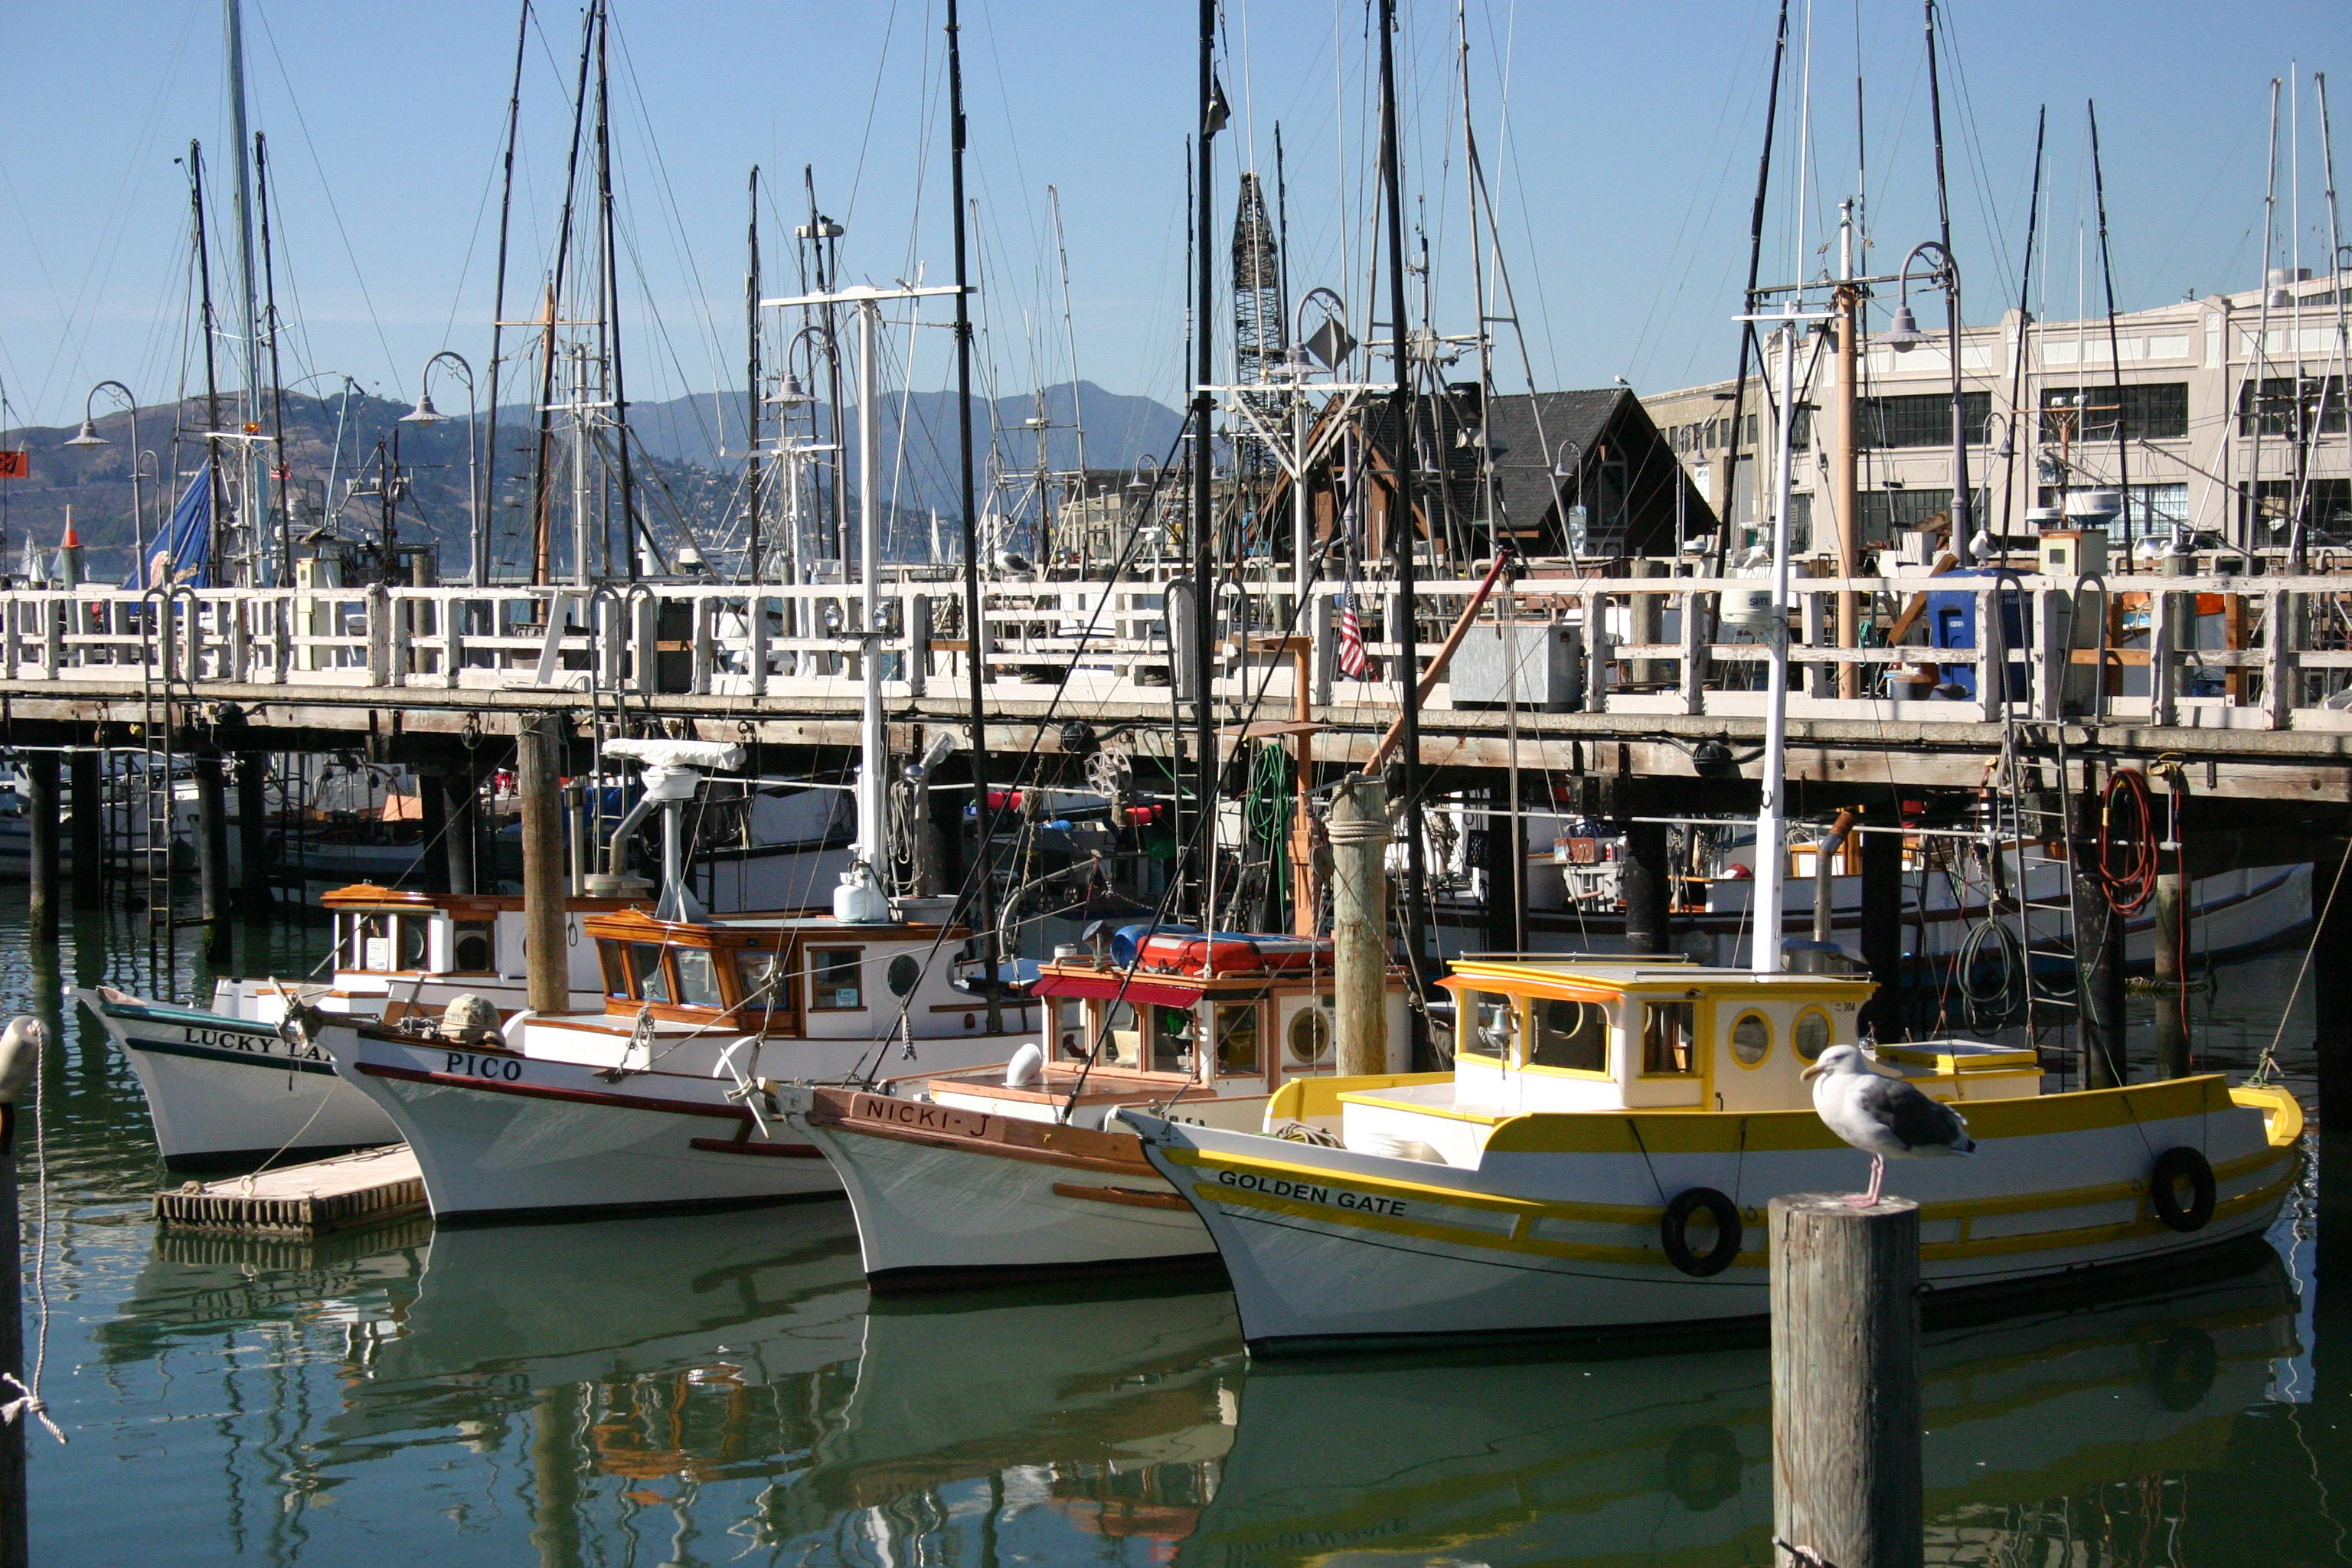 Boats in SF bay